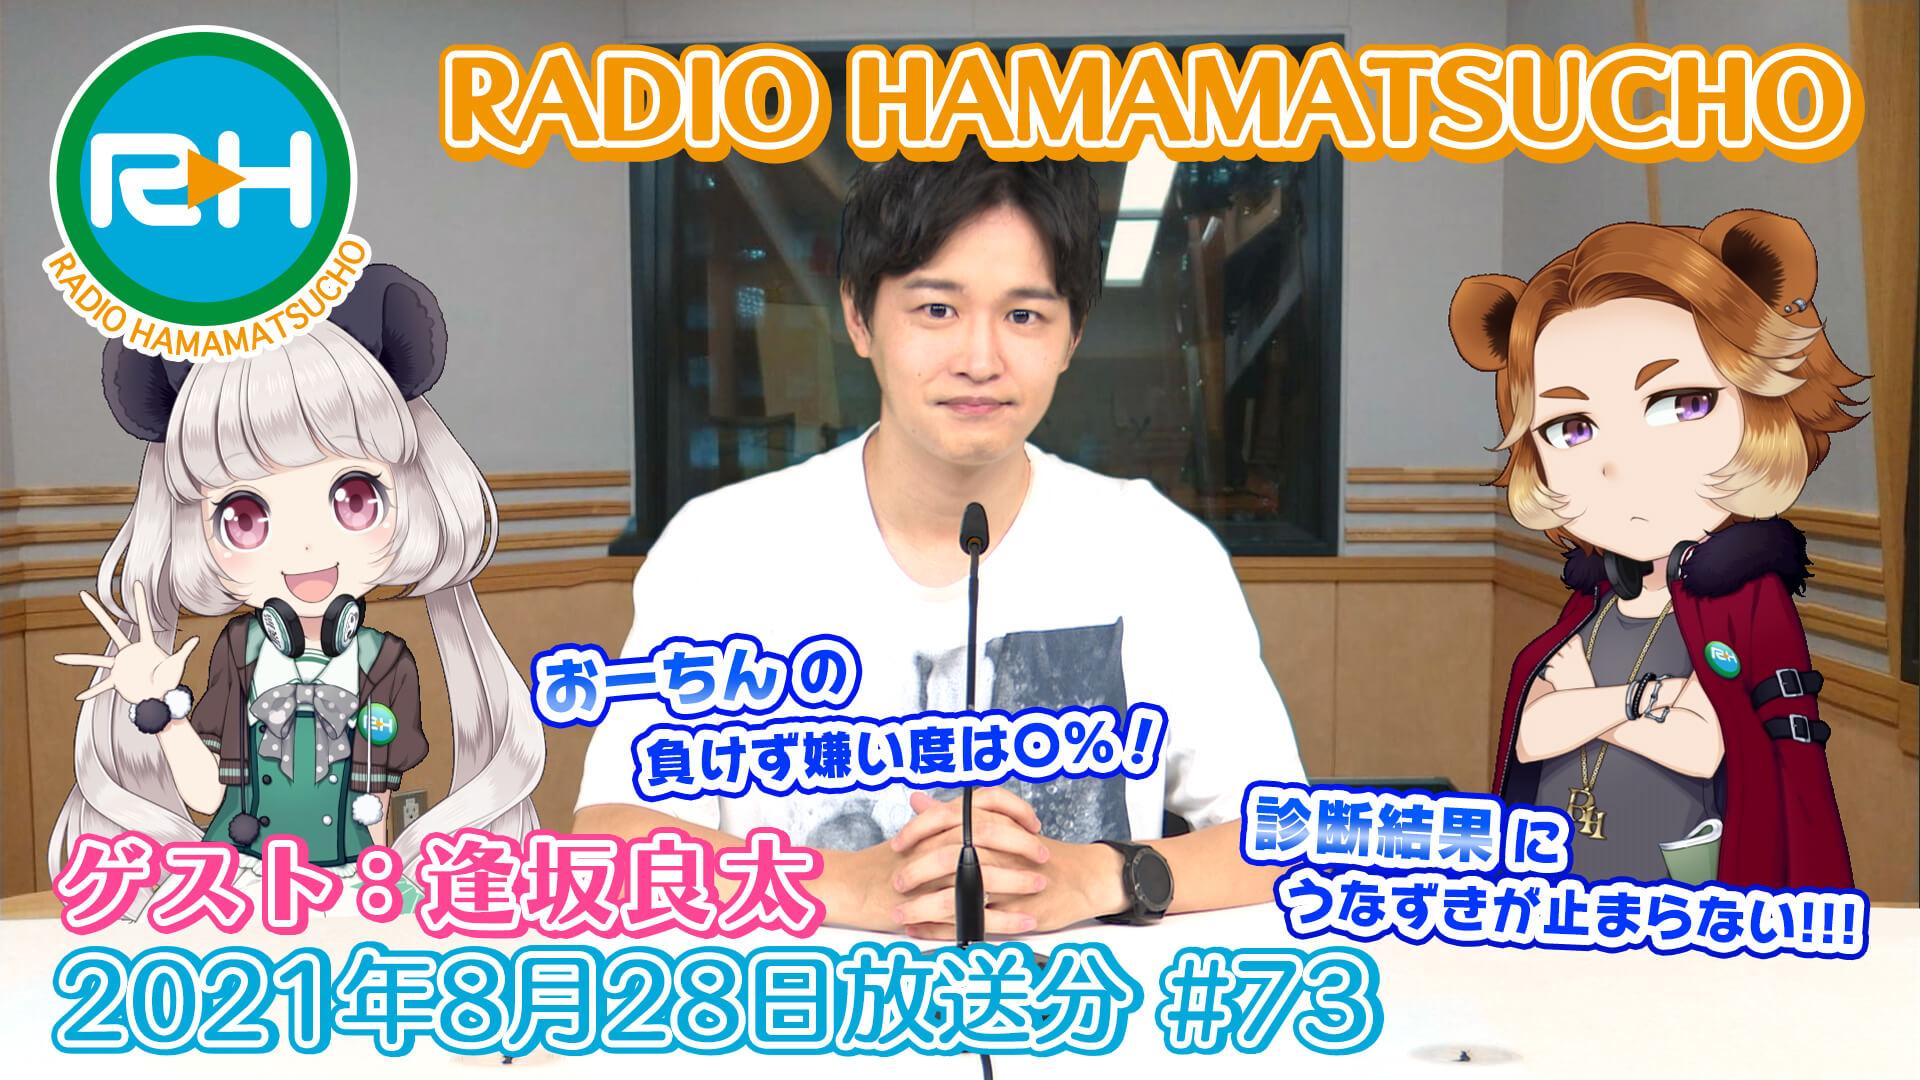 RADIO HAMAMATSUCHO 第73回 (2021年8月28日放送分) ゲスト: 逢坂良太